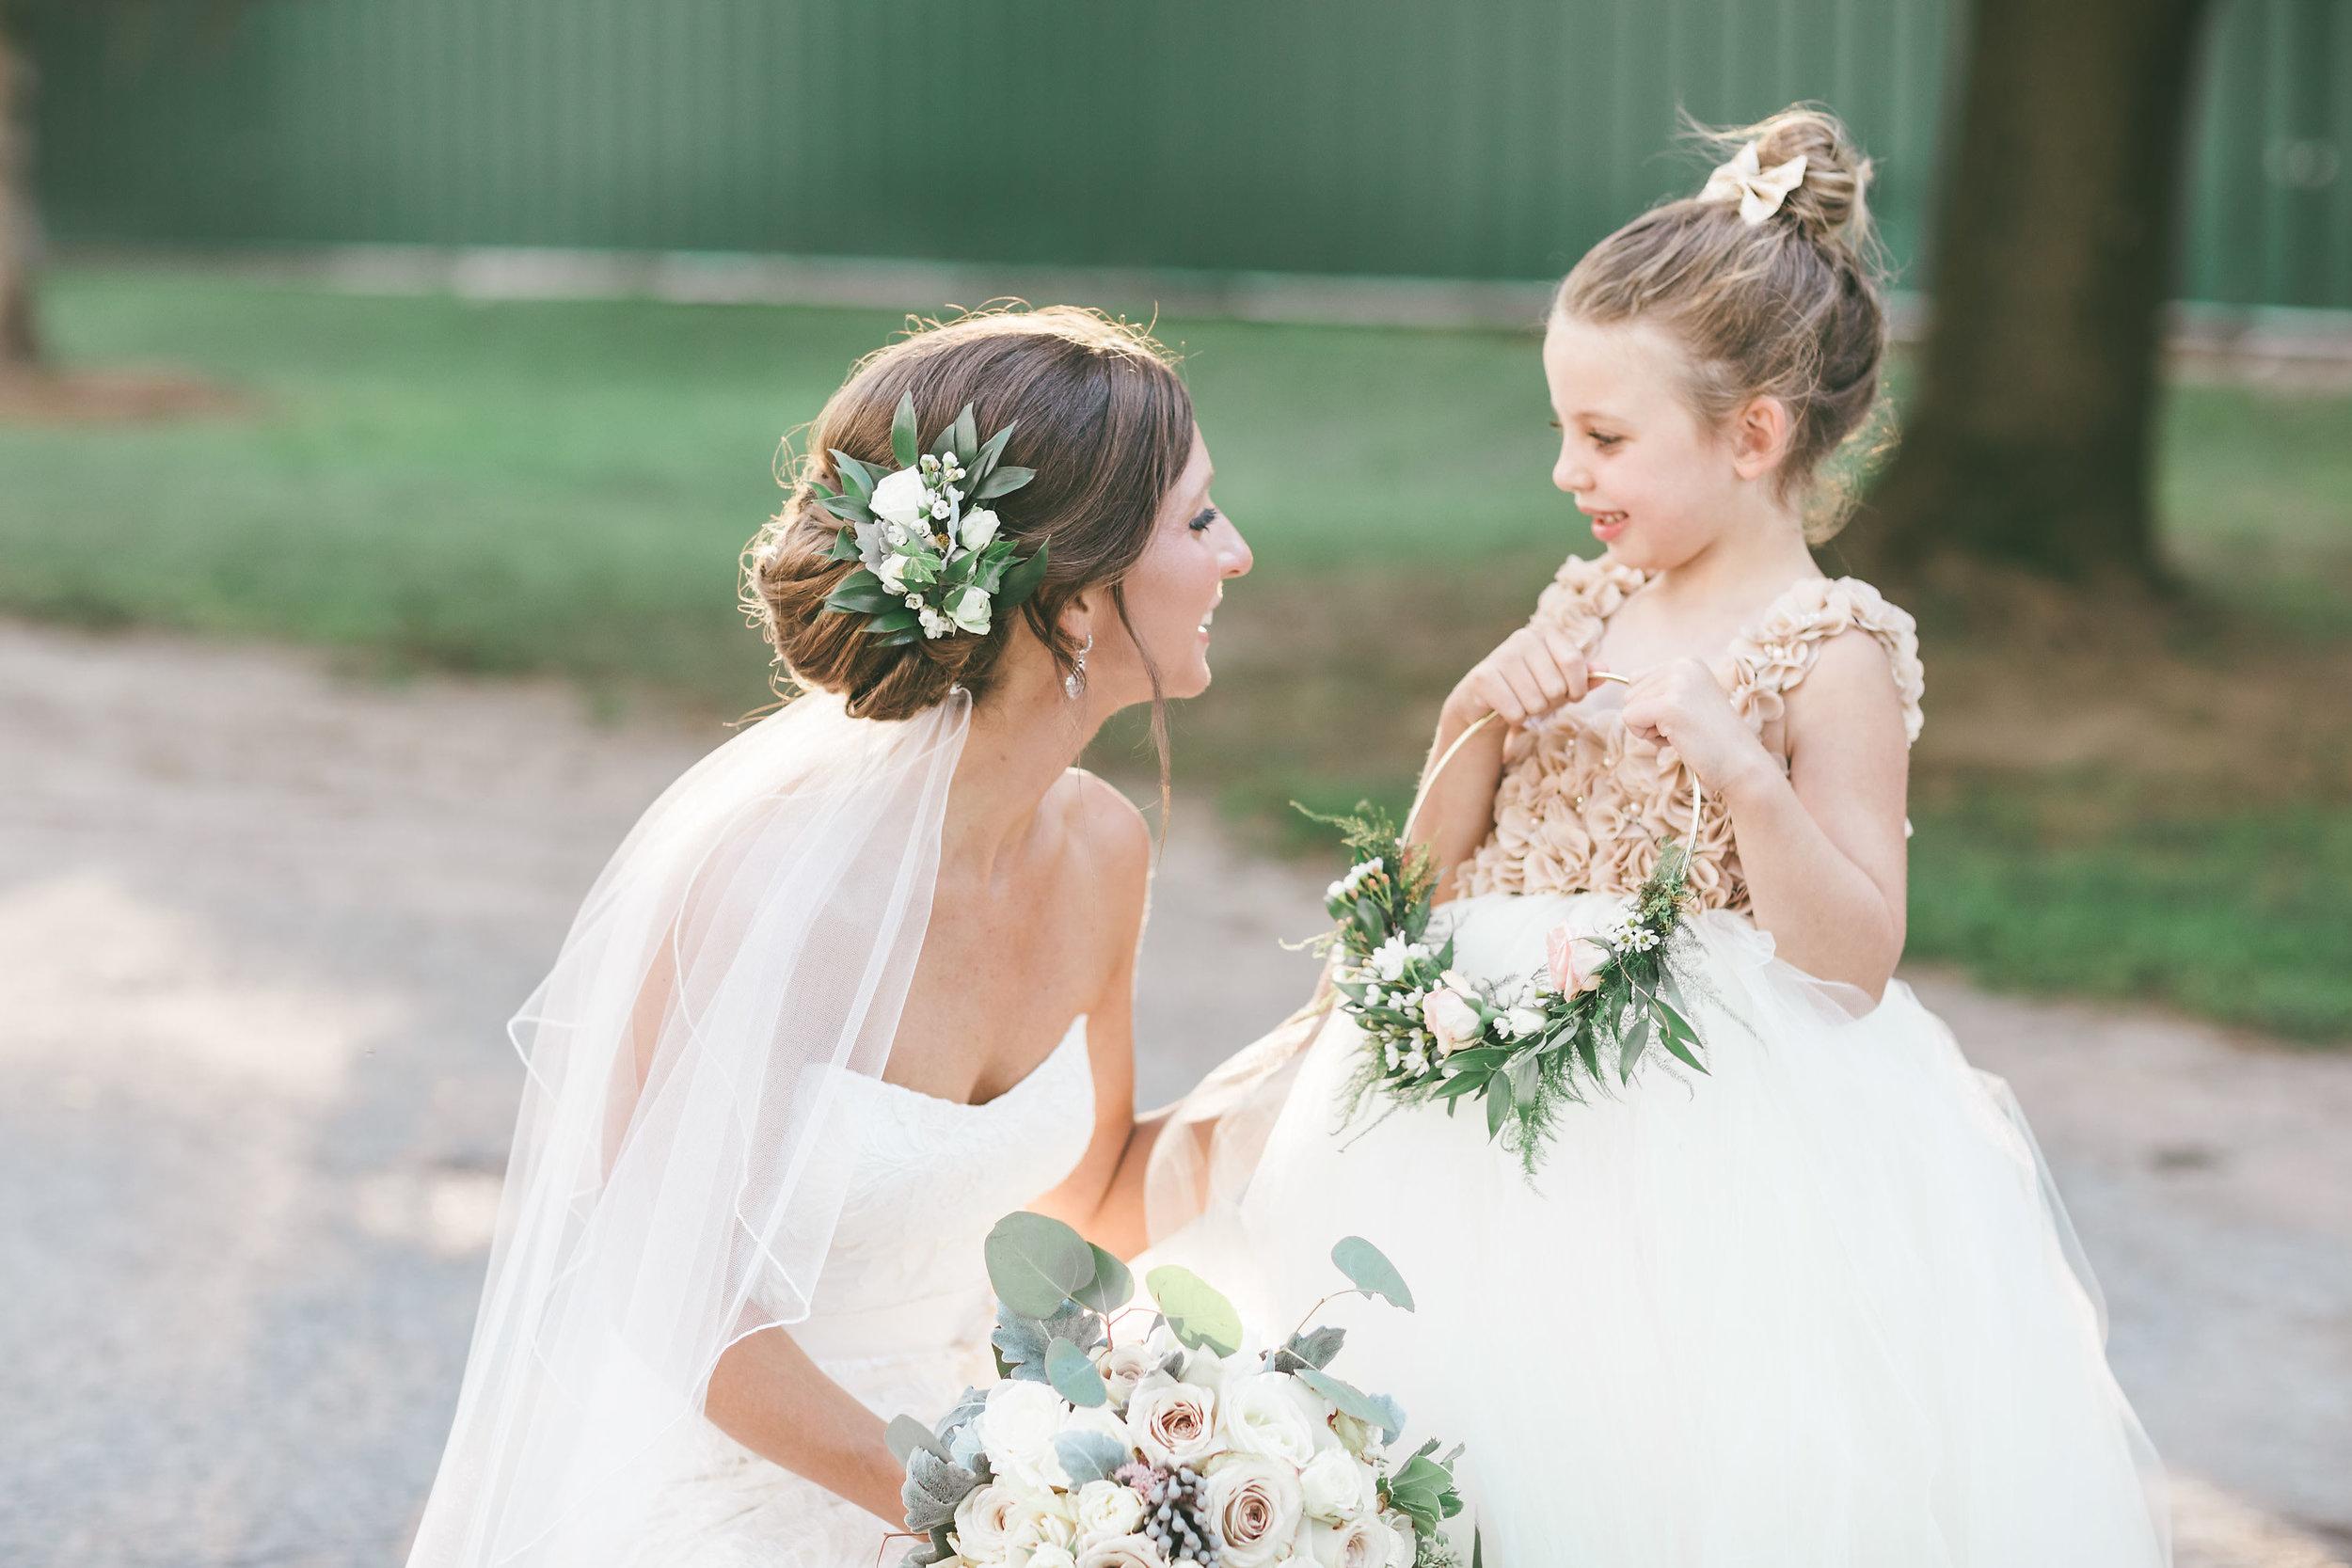 meaghan___darryl_wedding___danielcarusophotography___0942.jpg